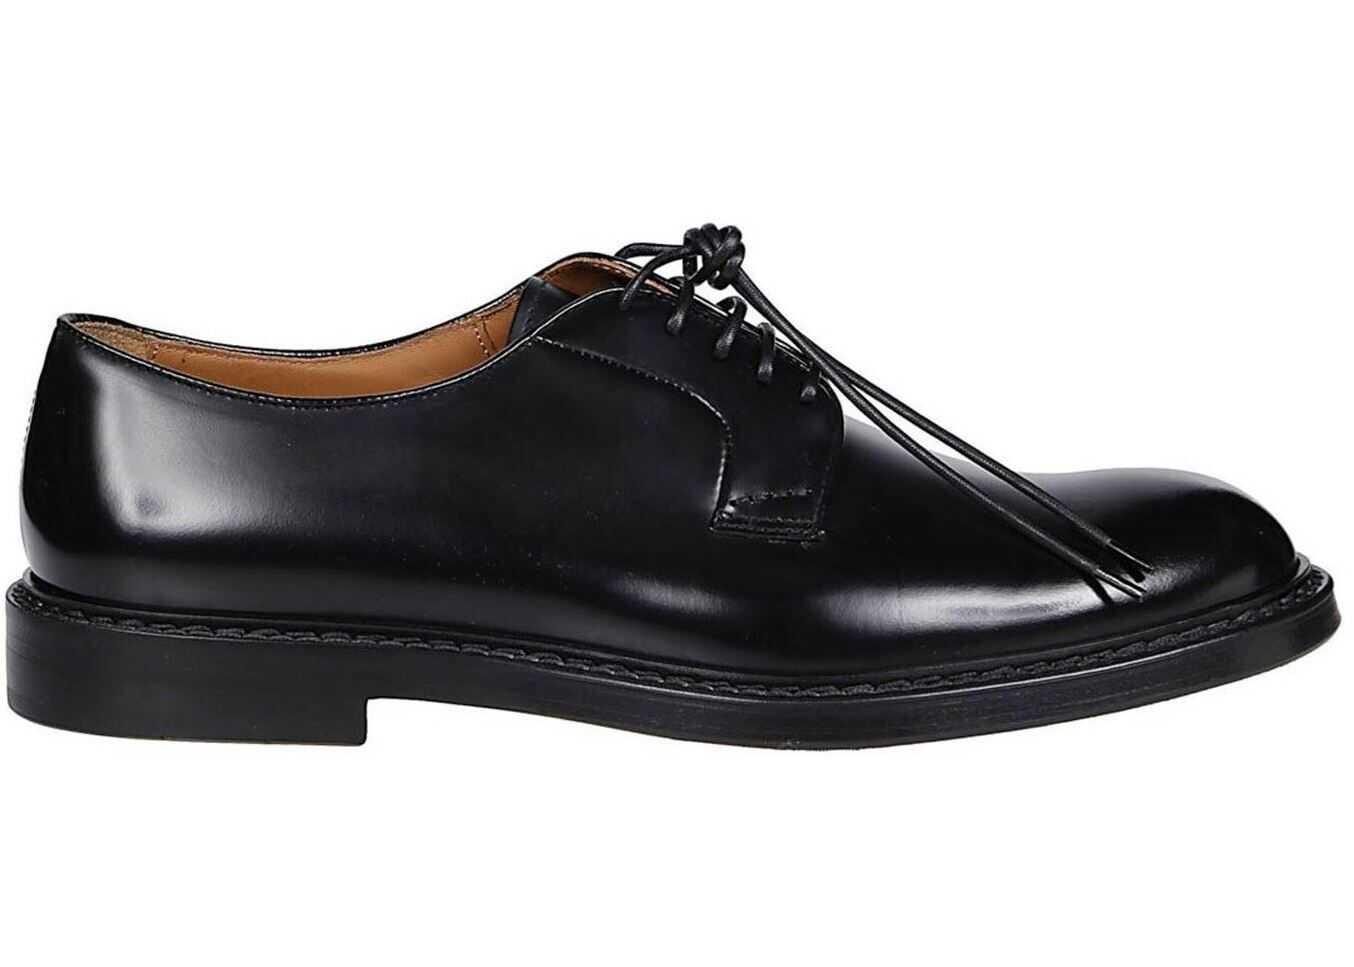 Doucal's Leather Derby Shoes DU1385SAVOUF007NHORSE Black imagine b-mall.ro